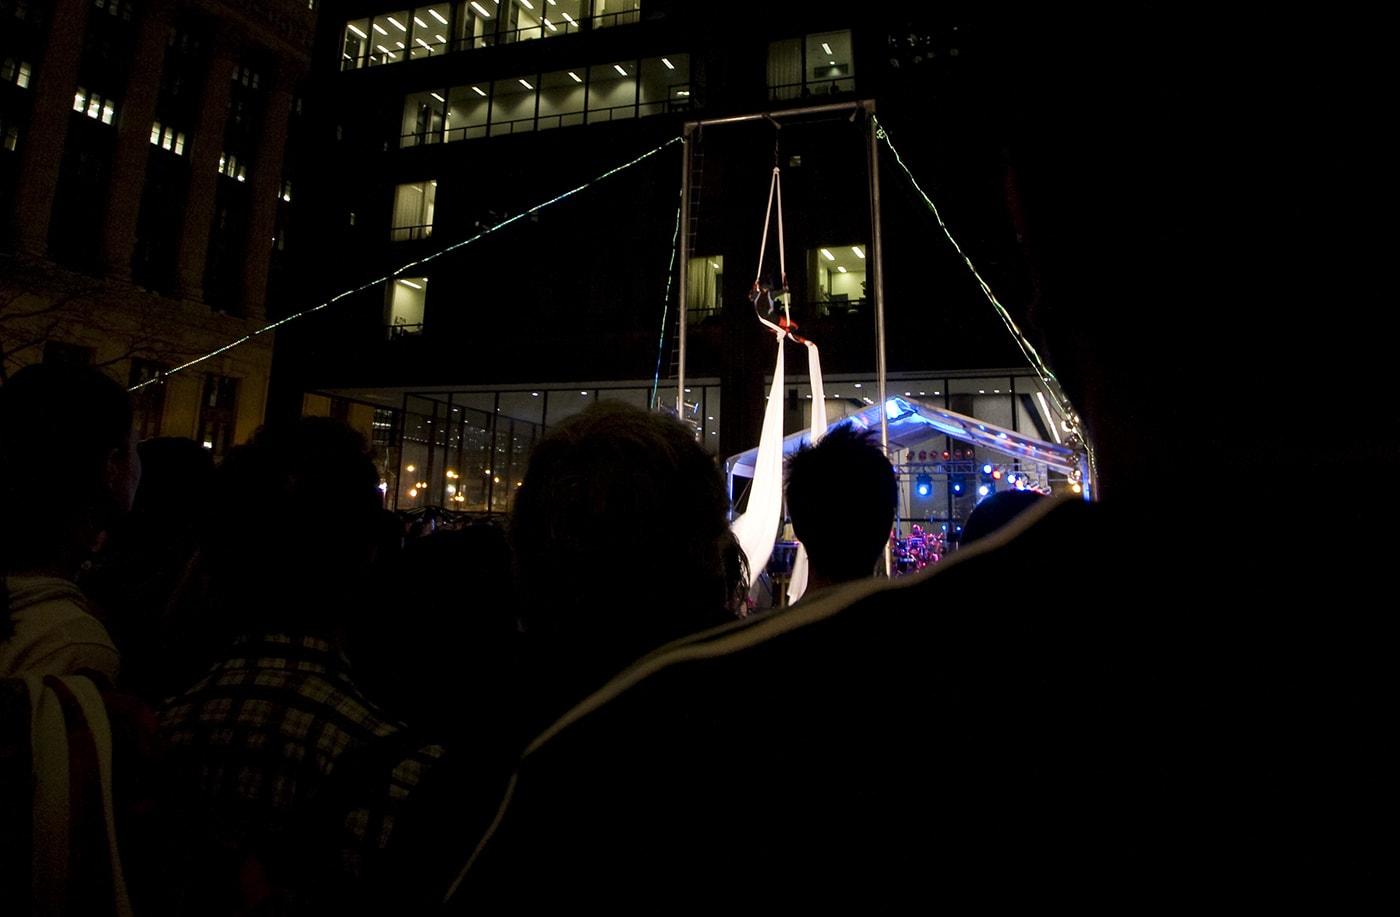 Midnight Circus at Looptopia in Chicago, Illinois.